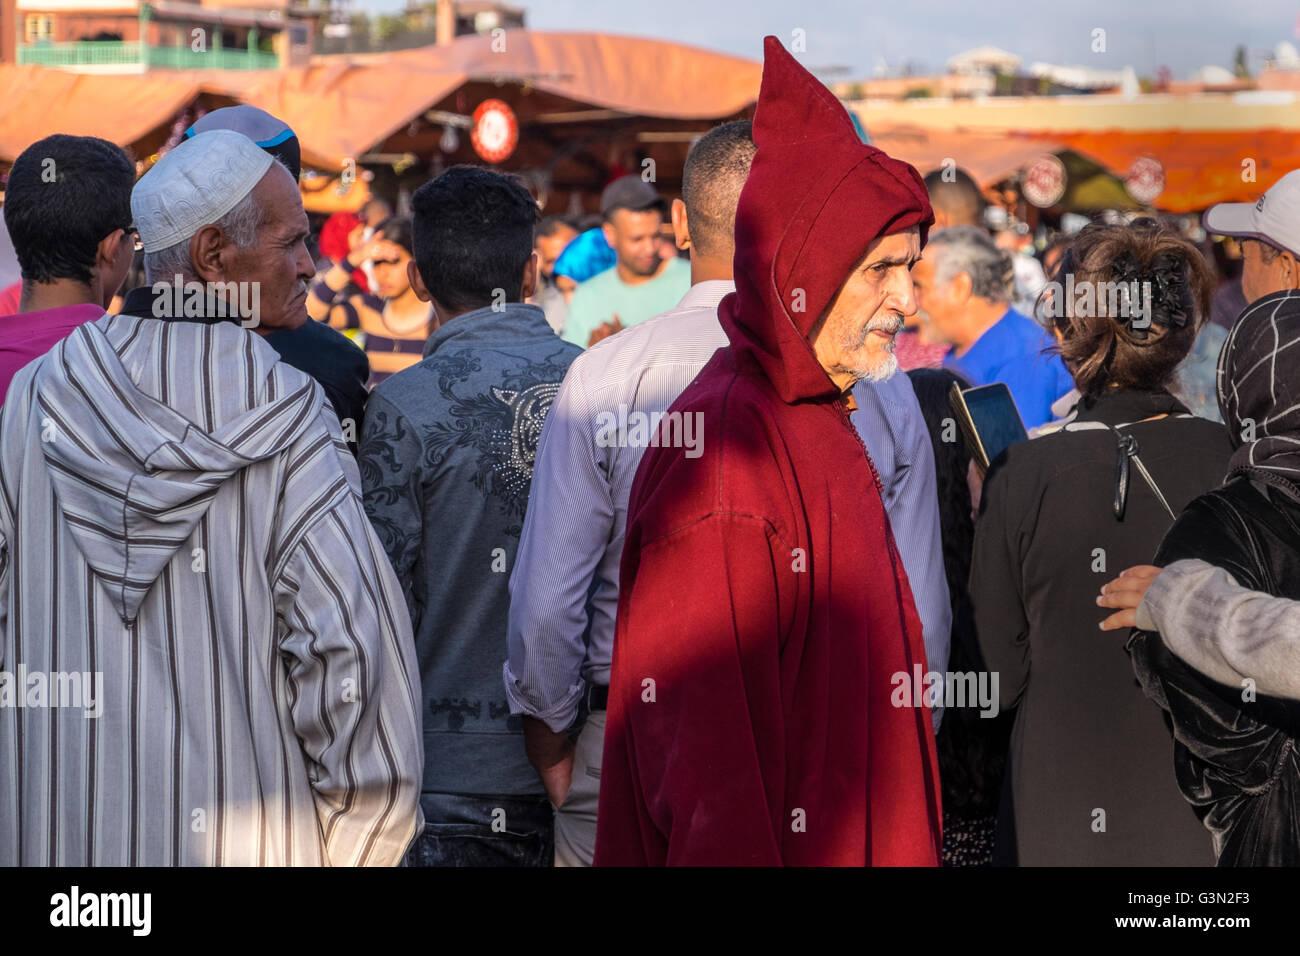 Traditionell gekleidete Marokkaner, Marrakech/Marrakesch, Marokko Stockbild